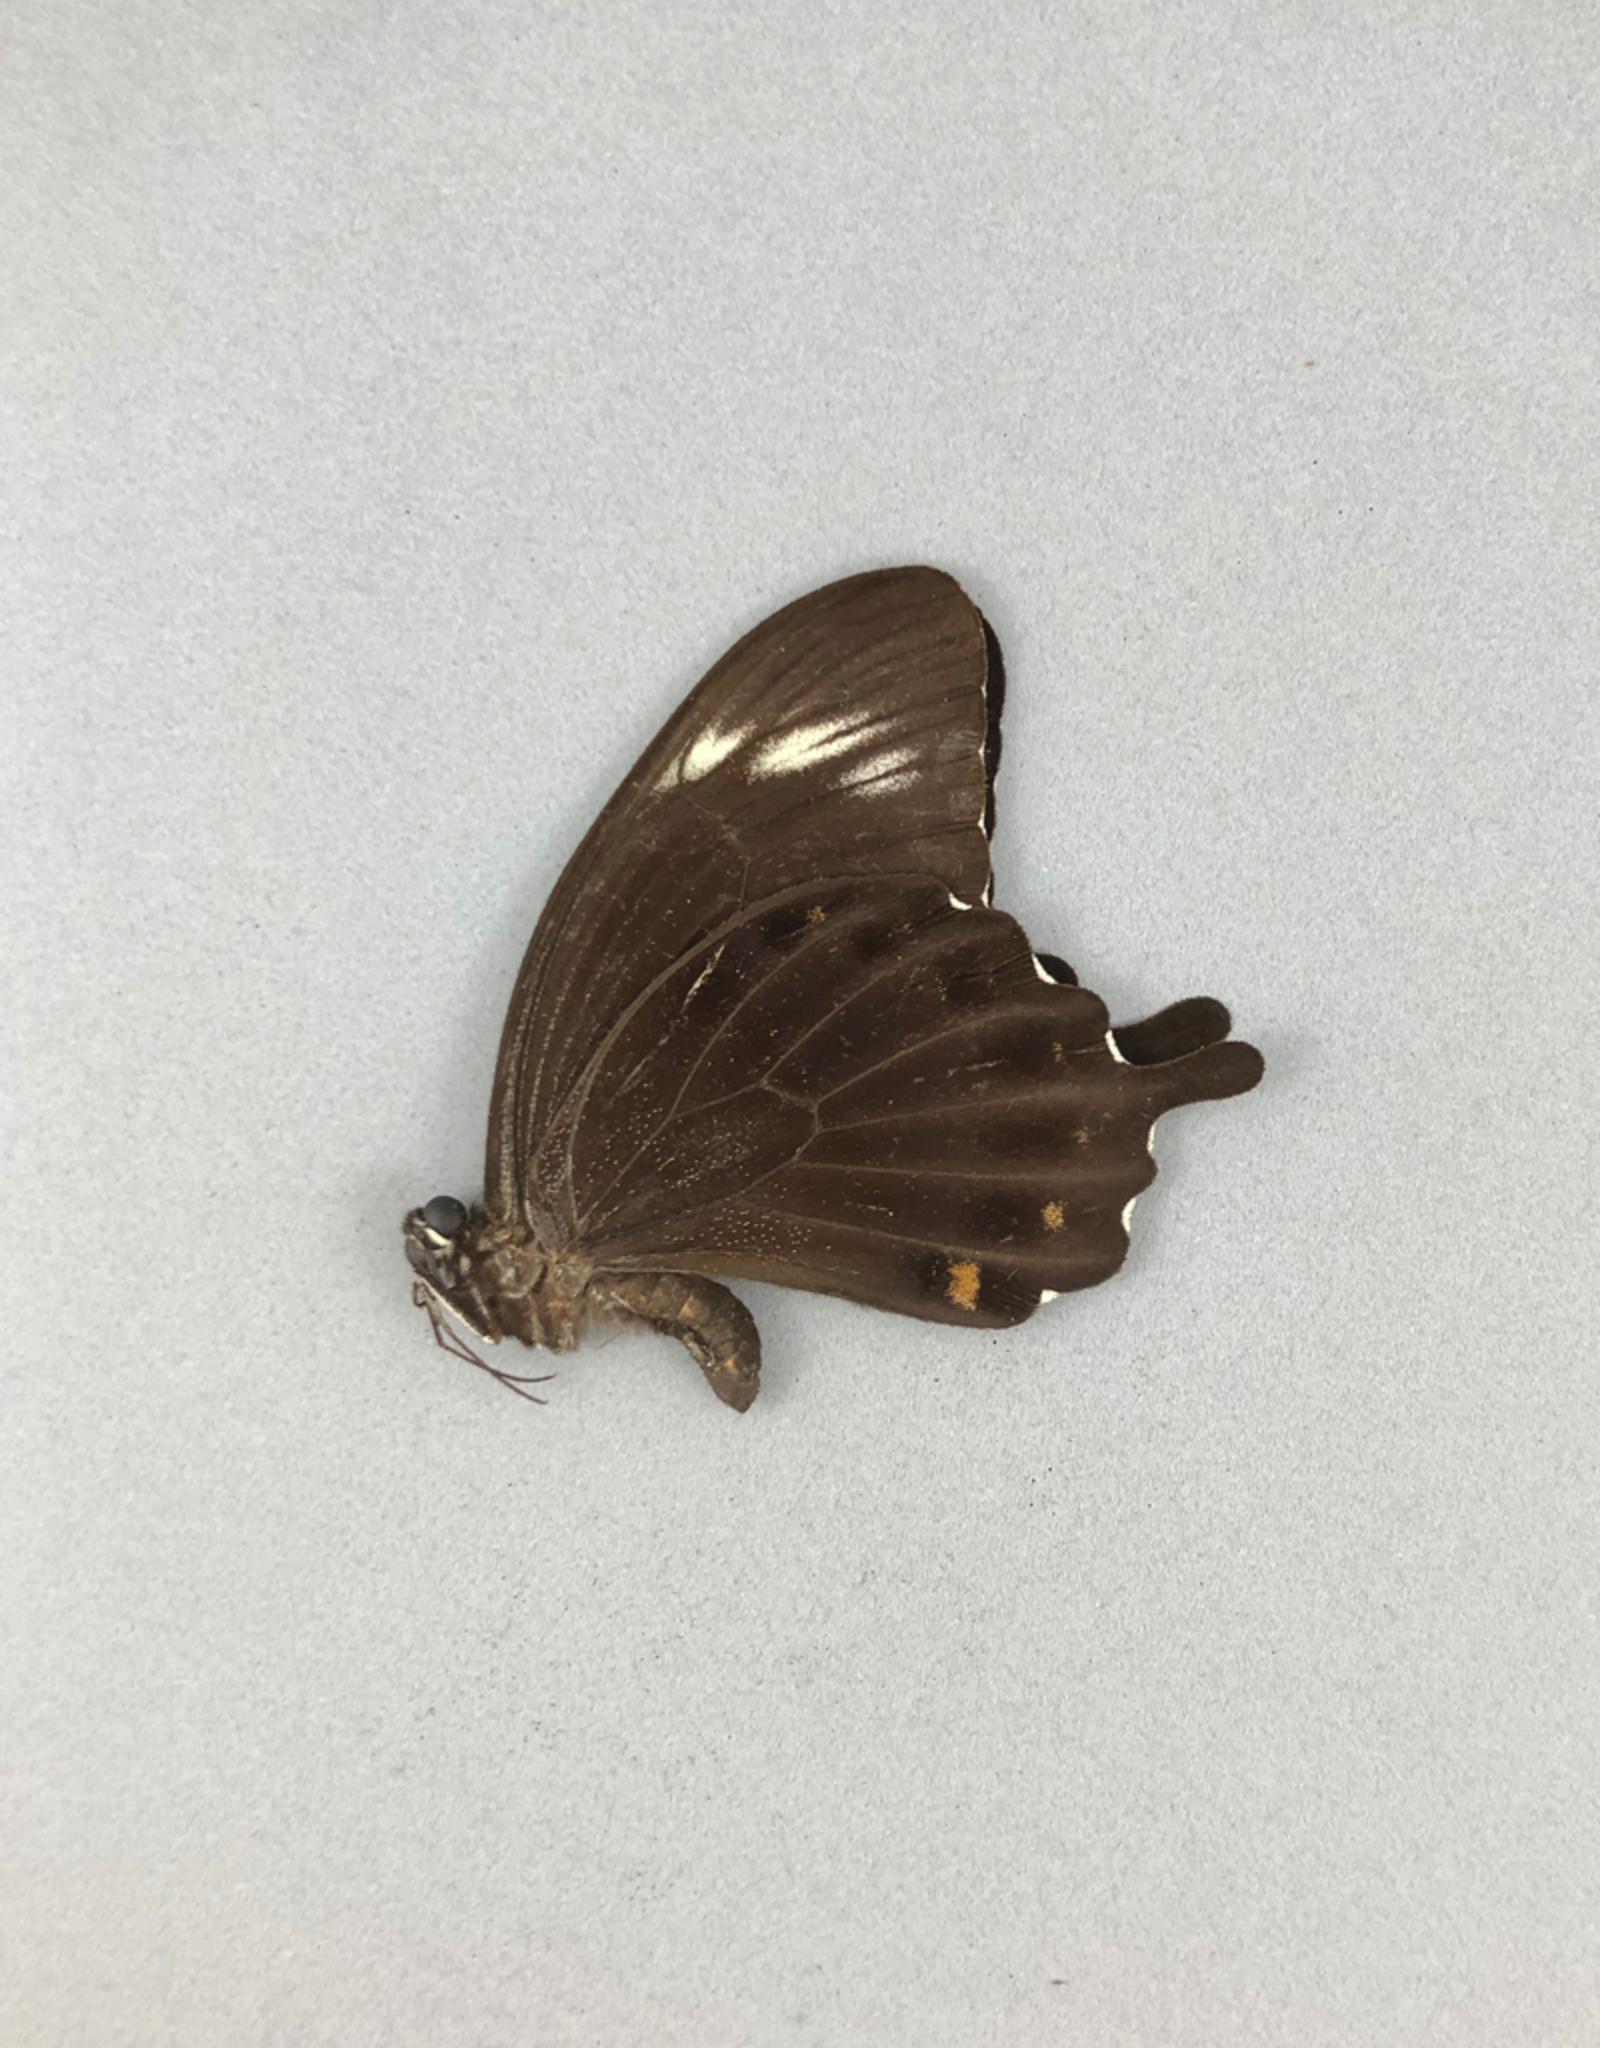 Papilio fuscus thomsoni M A1/A1- Indonesia